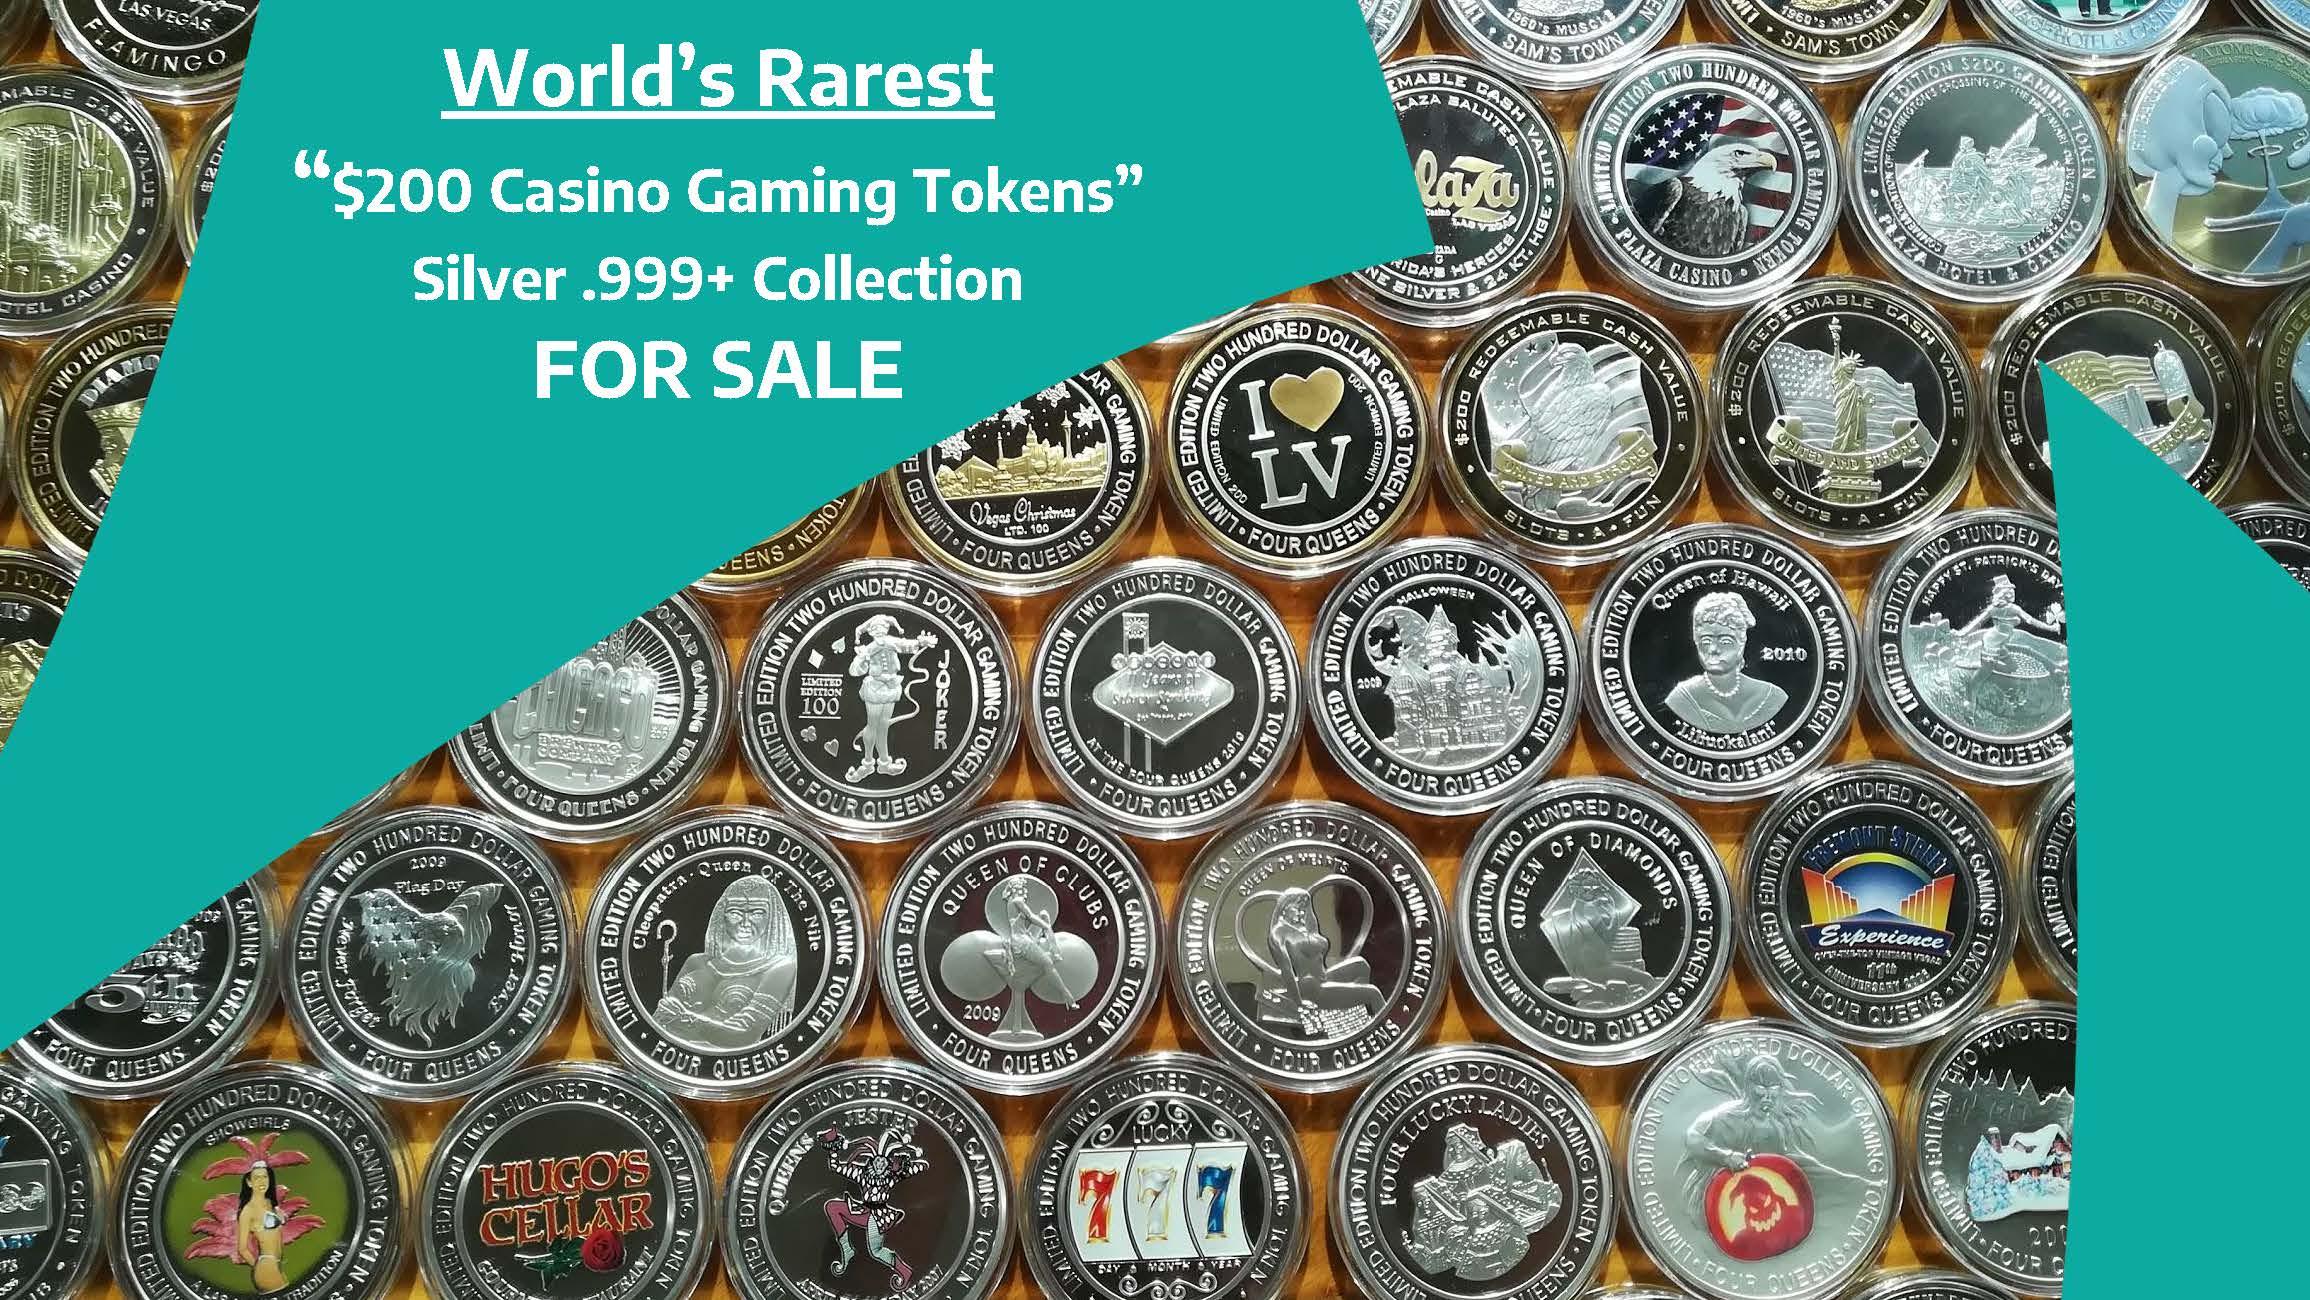 Casino silver coins mercenaries 2 free online game